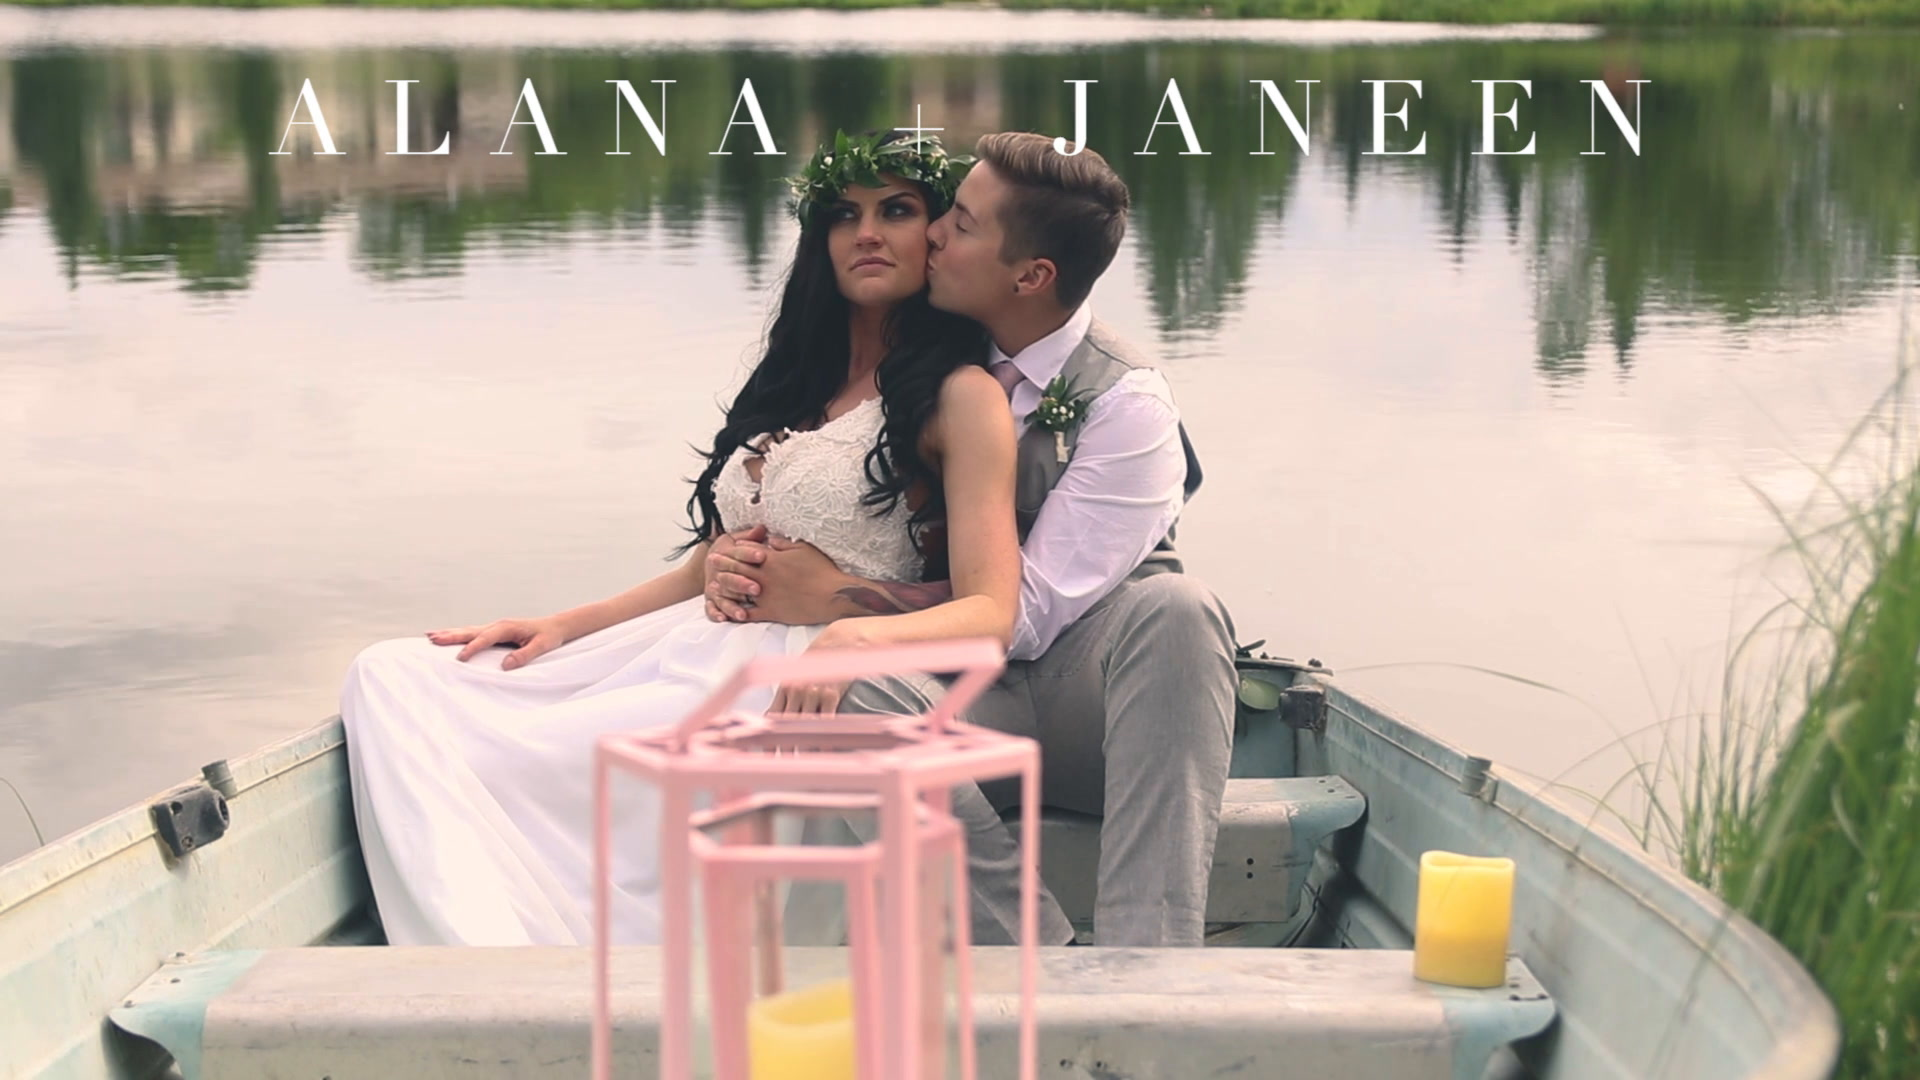 Alana + Janeen | Edmonton, Canada | Family Home